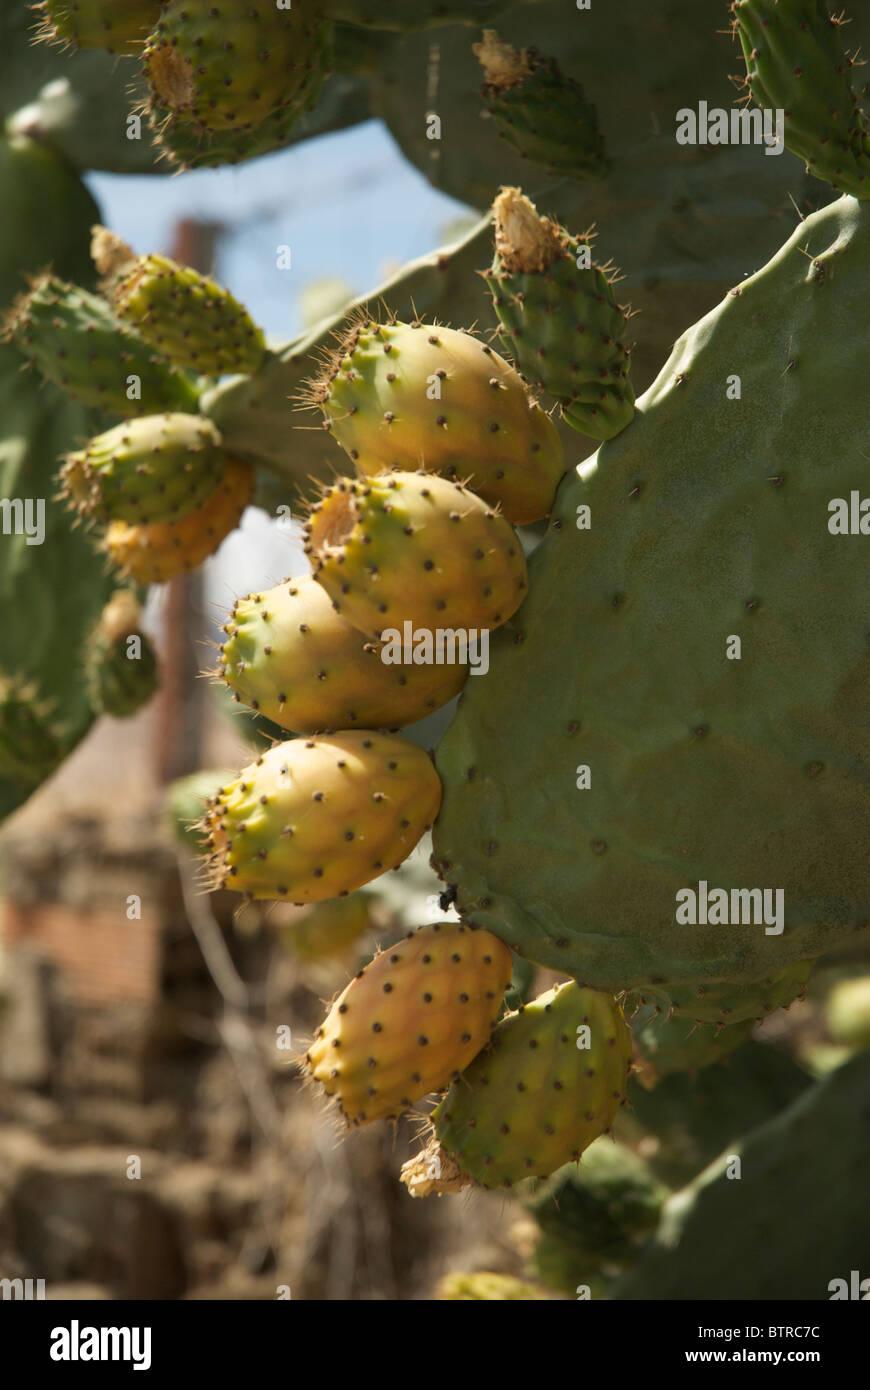 Spain, Logrosan, Generic prickly pear cactus Stock Photo